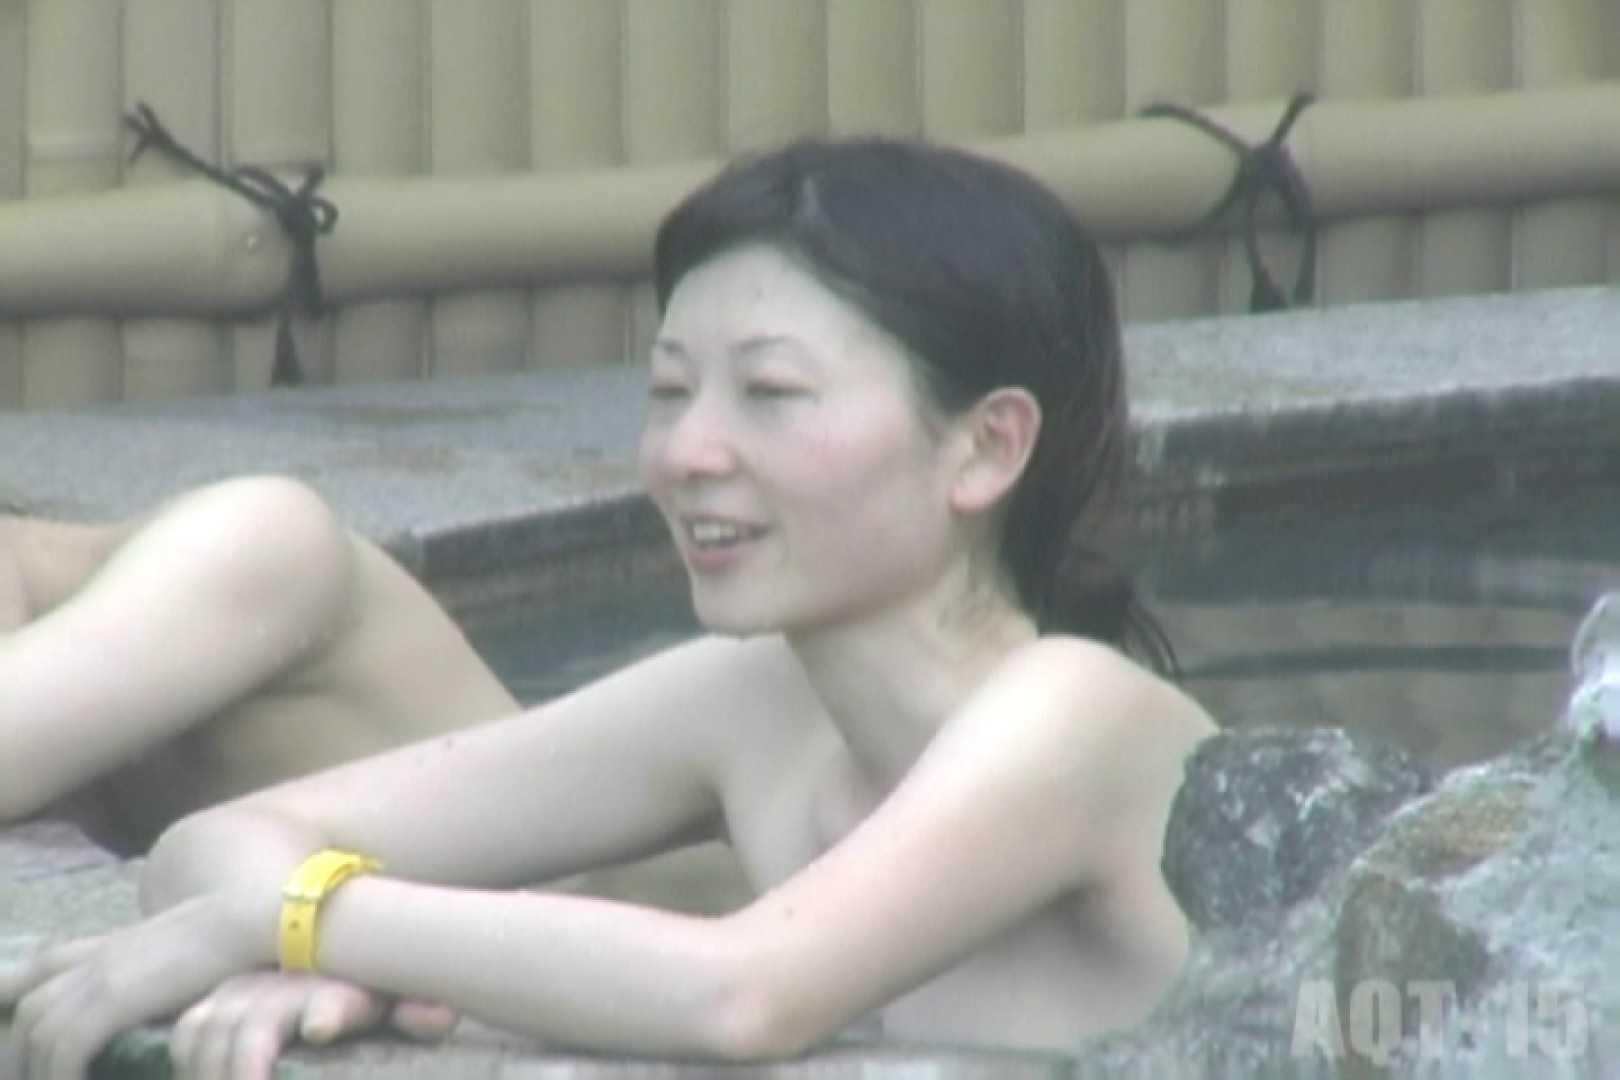 Aquaな露天風呂Vol.835 盗撮シリーズ   露天風呂編  92PIX 15